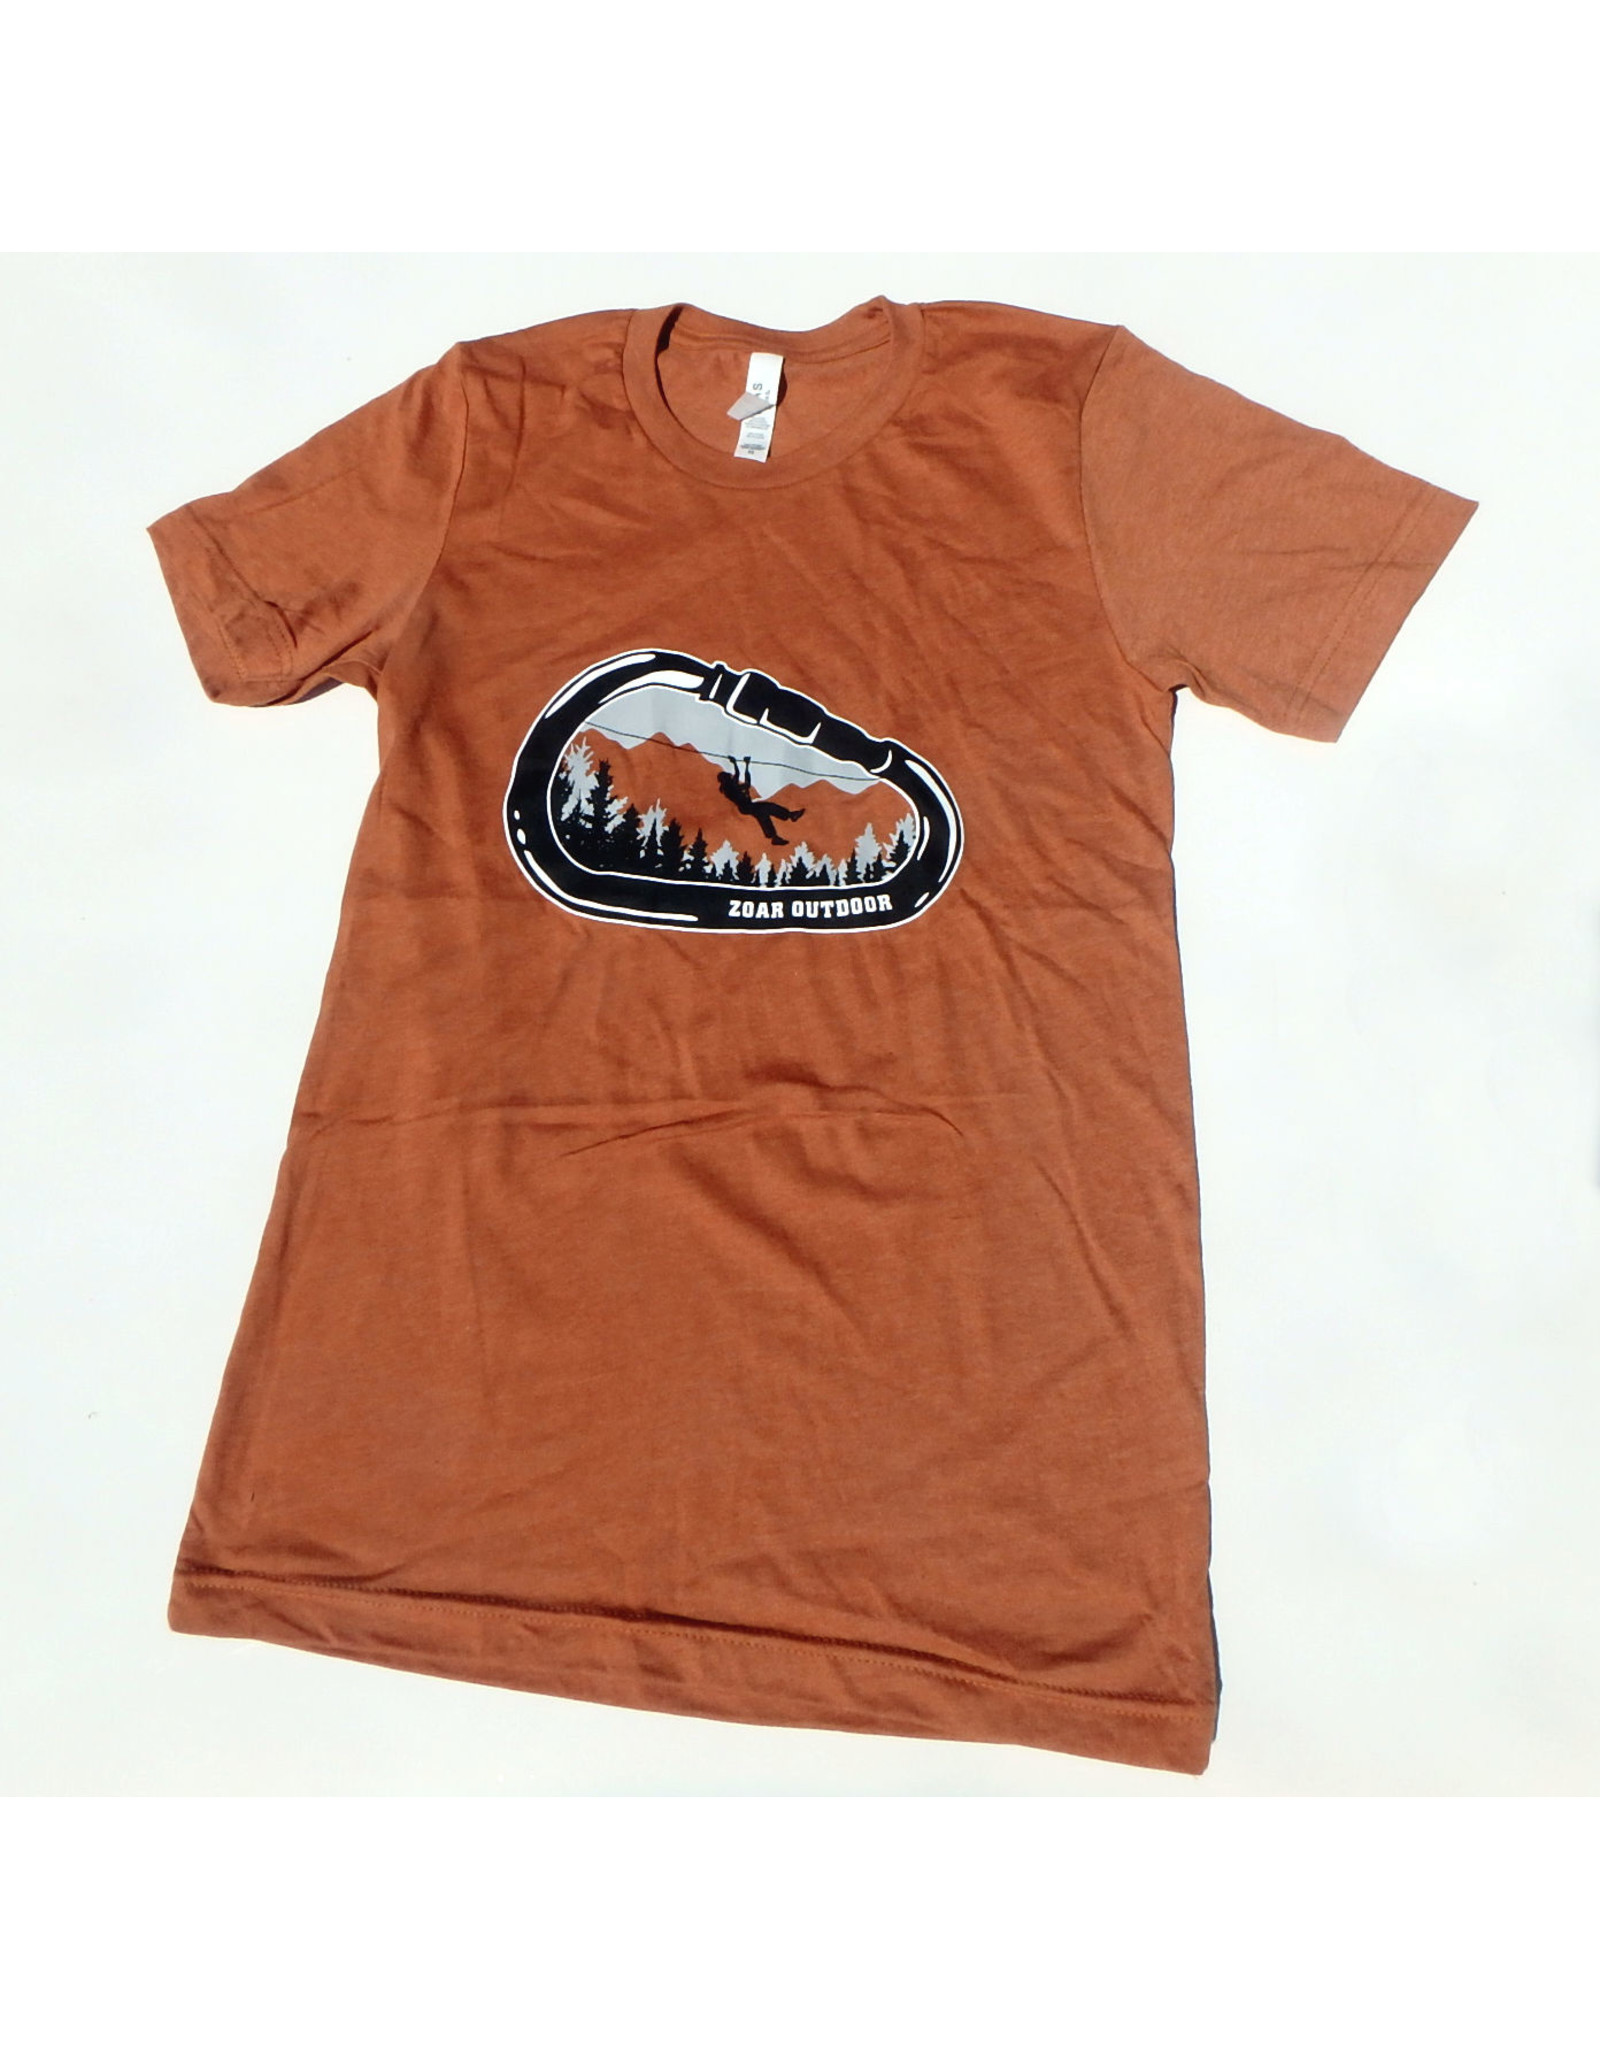 Carabineer Shirt